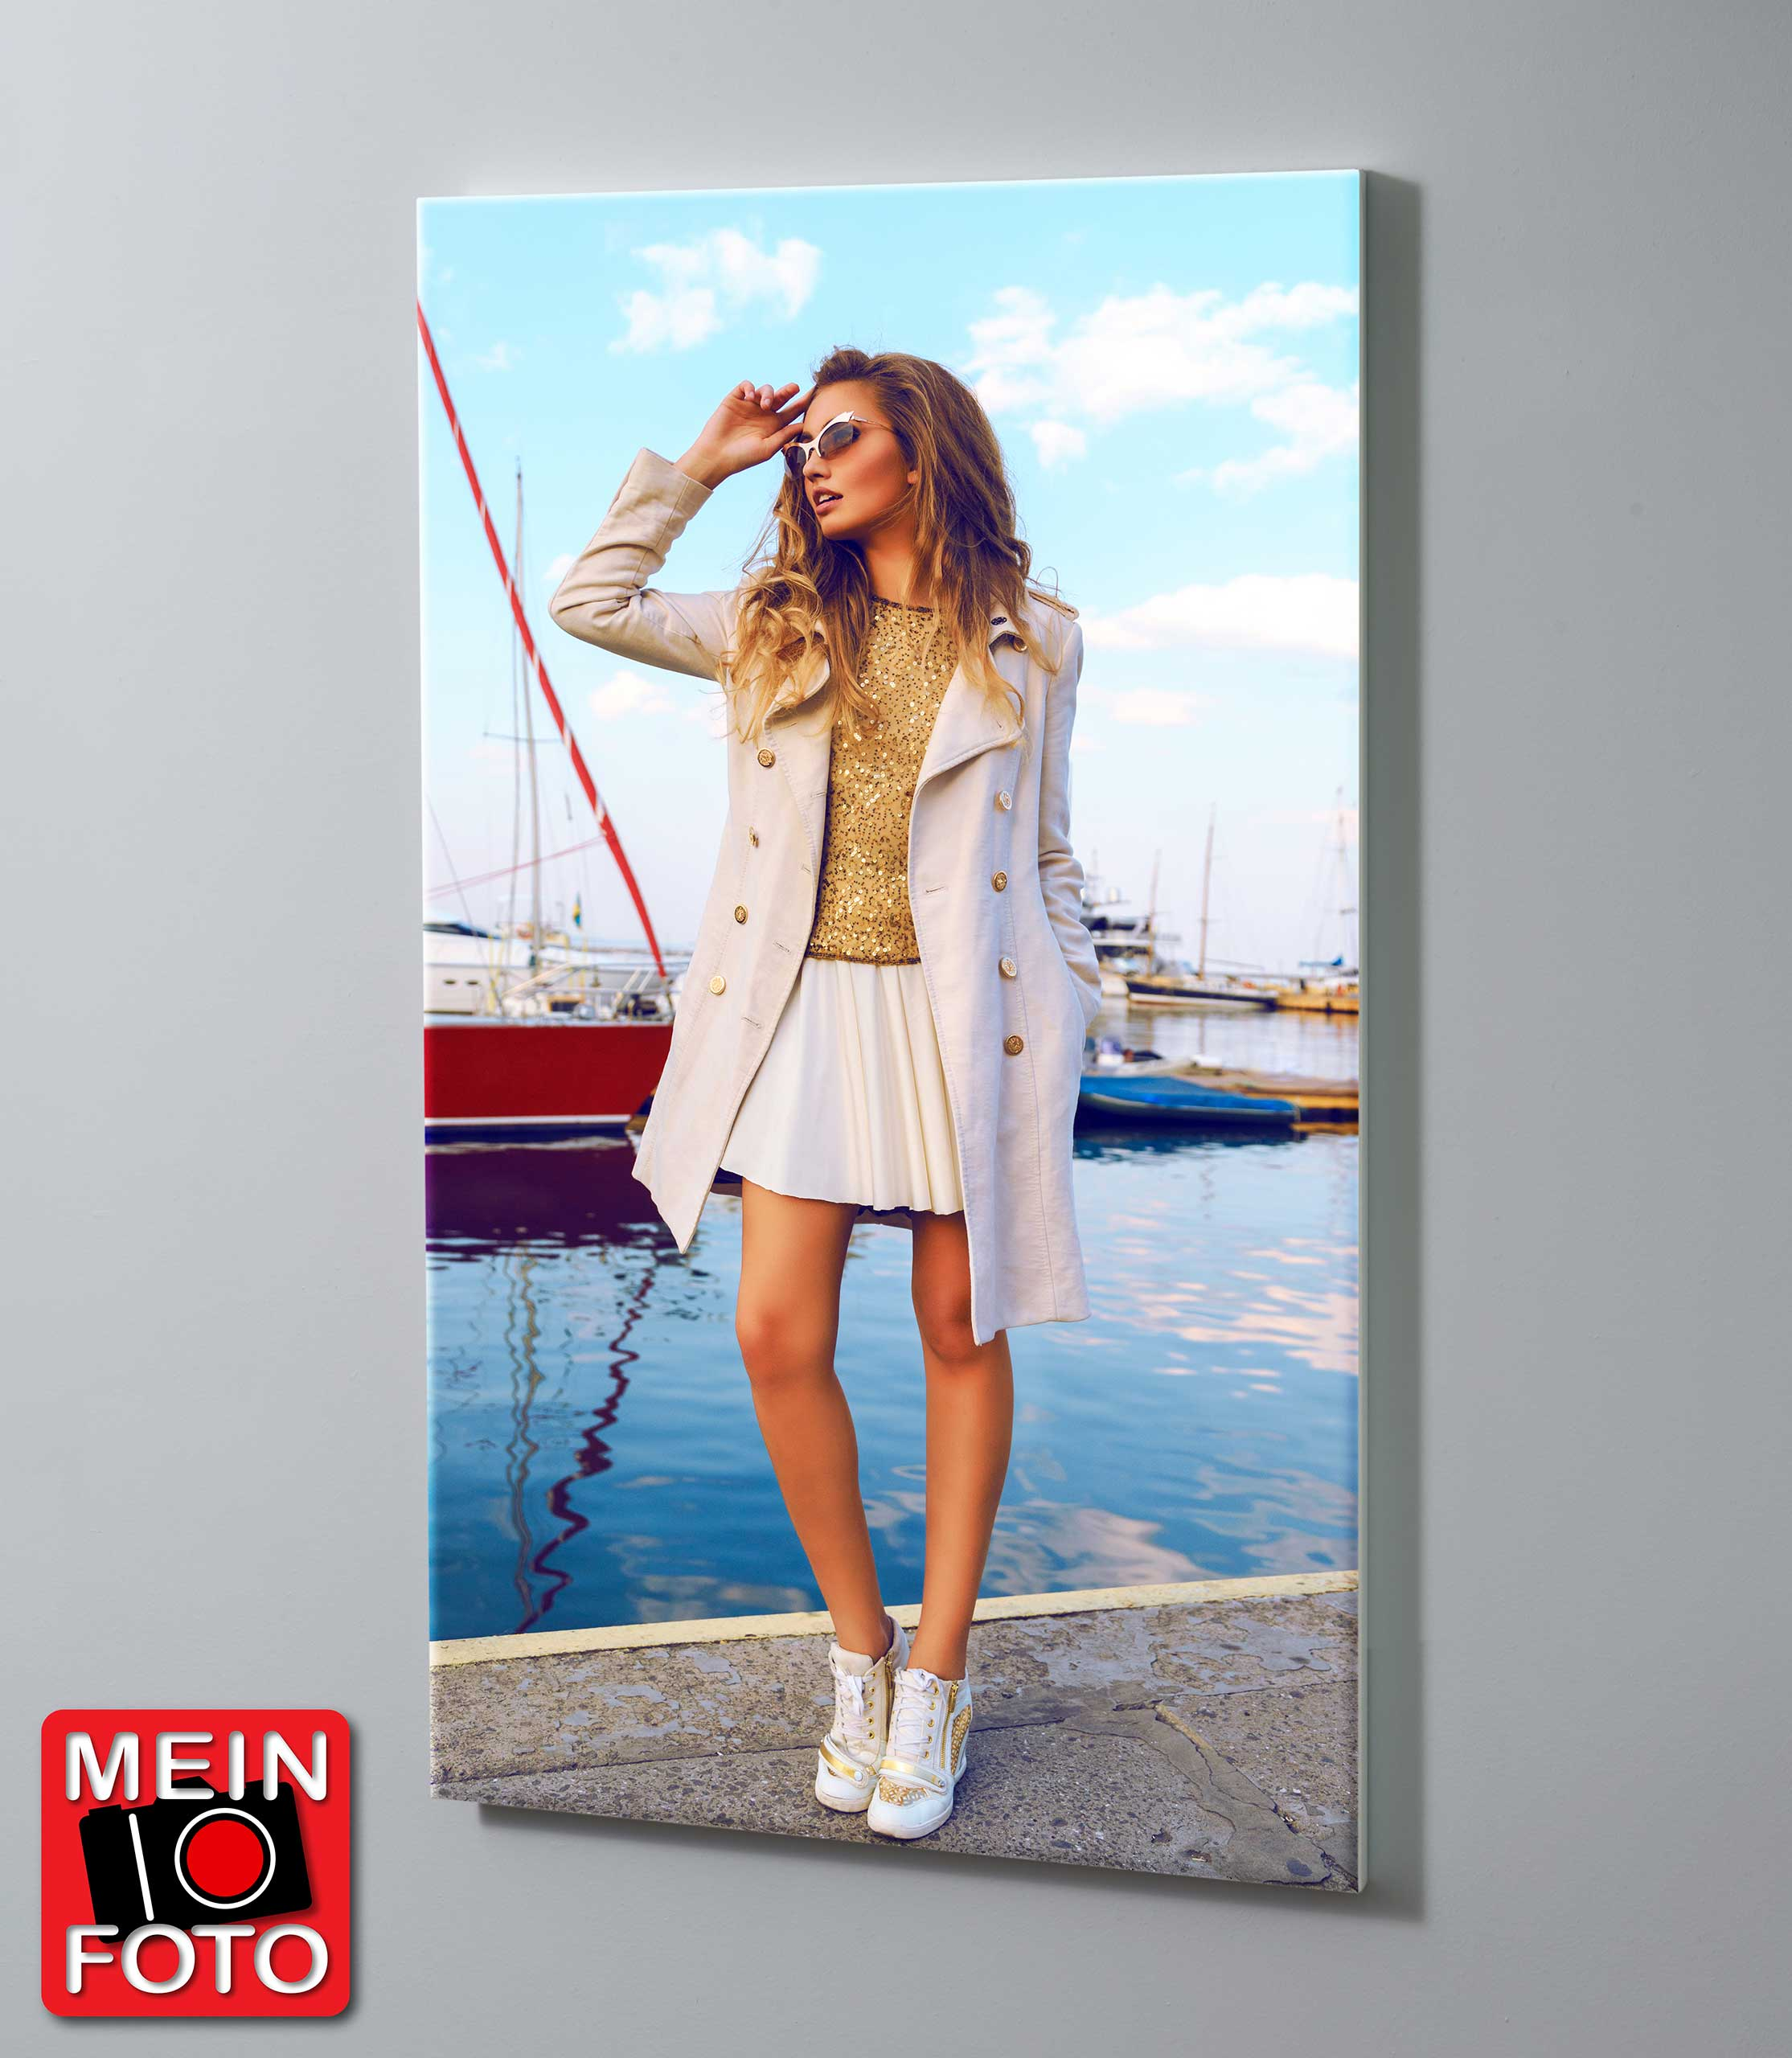 "Magnettafel SASSNITZ 90x60cm Motiv-Pinnwand ""Mein Foto"""